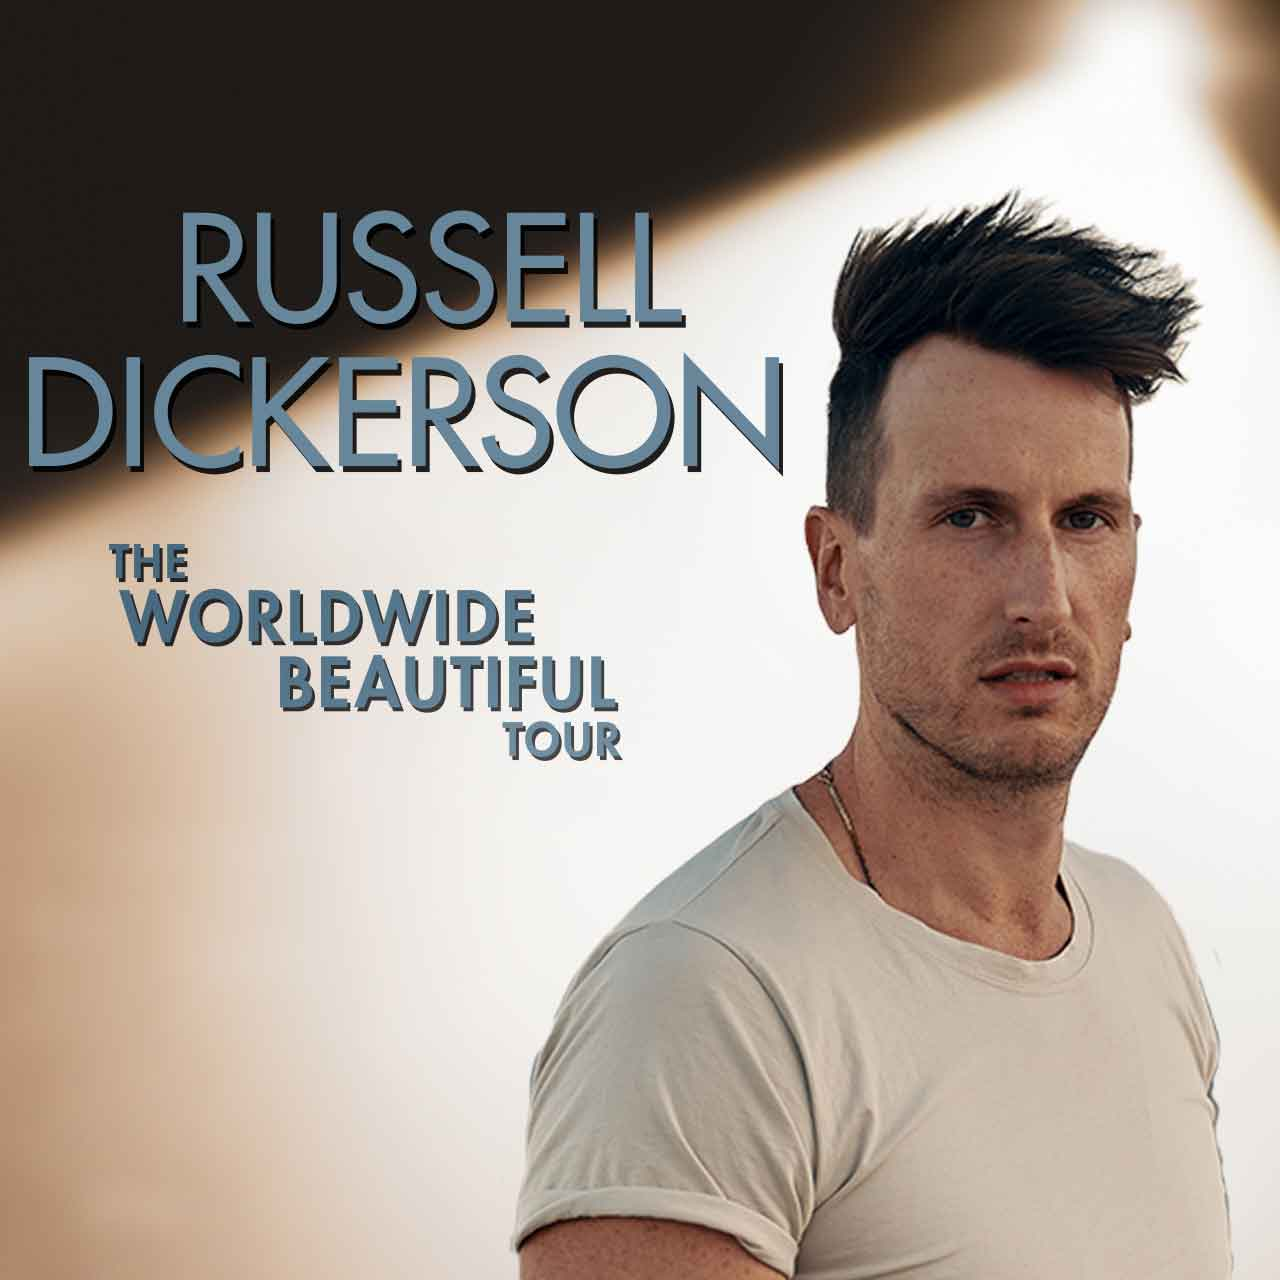 The Worldwide Beautiful Tour